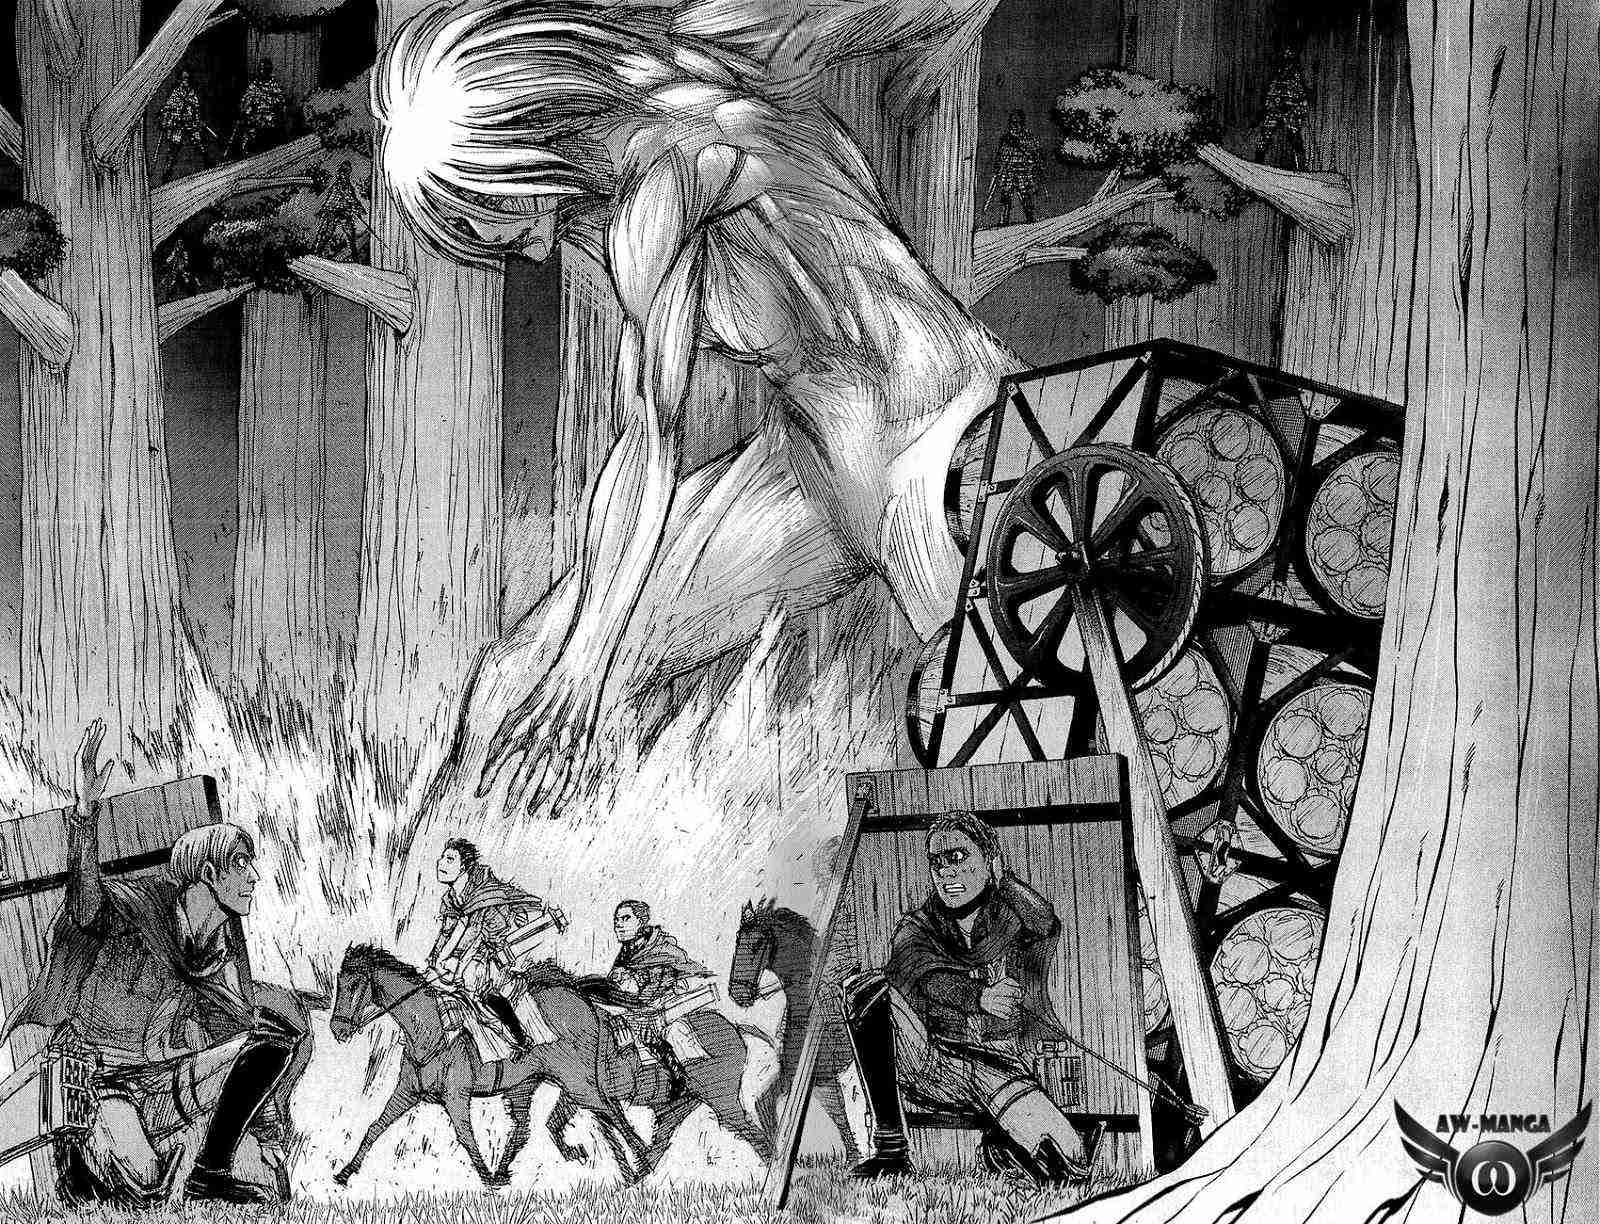 Dilarang COPAS - situs resmi www.mangacanblog.com - Komik shingeki no kyojin 026 - cara yang bijak 27 Indonesia shingeki no kyojin 026 - cara yang bijak Terbaru 34|Baca Manga Komik Indonesia|Mangacan